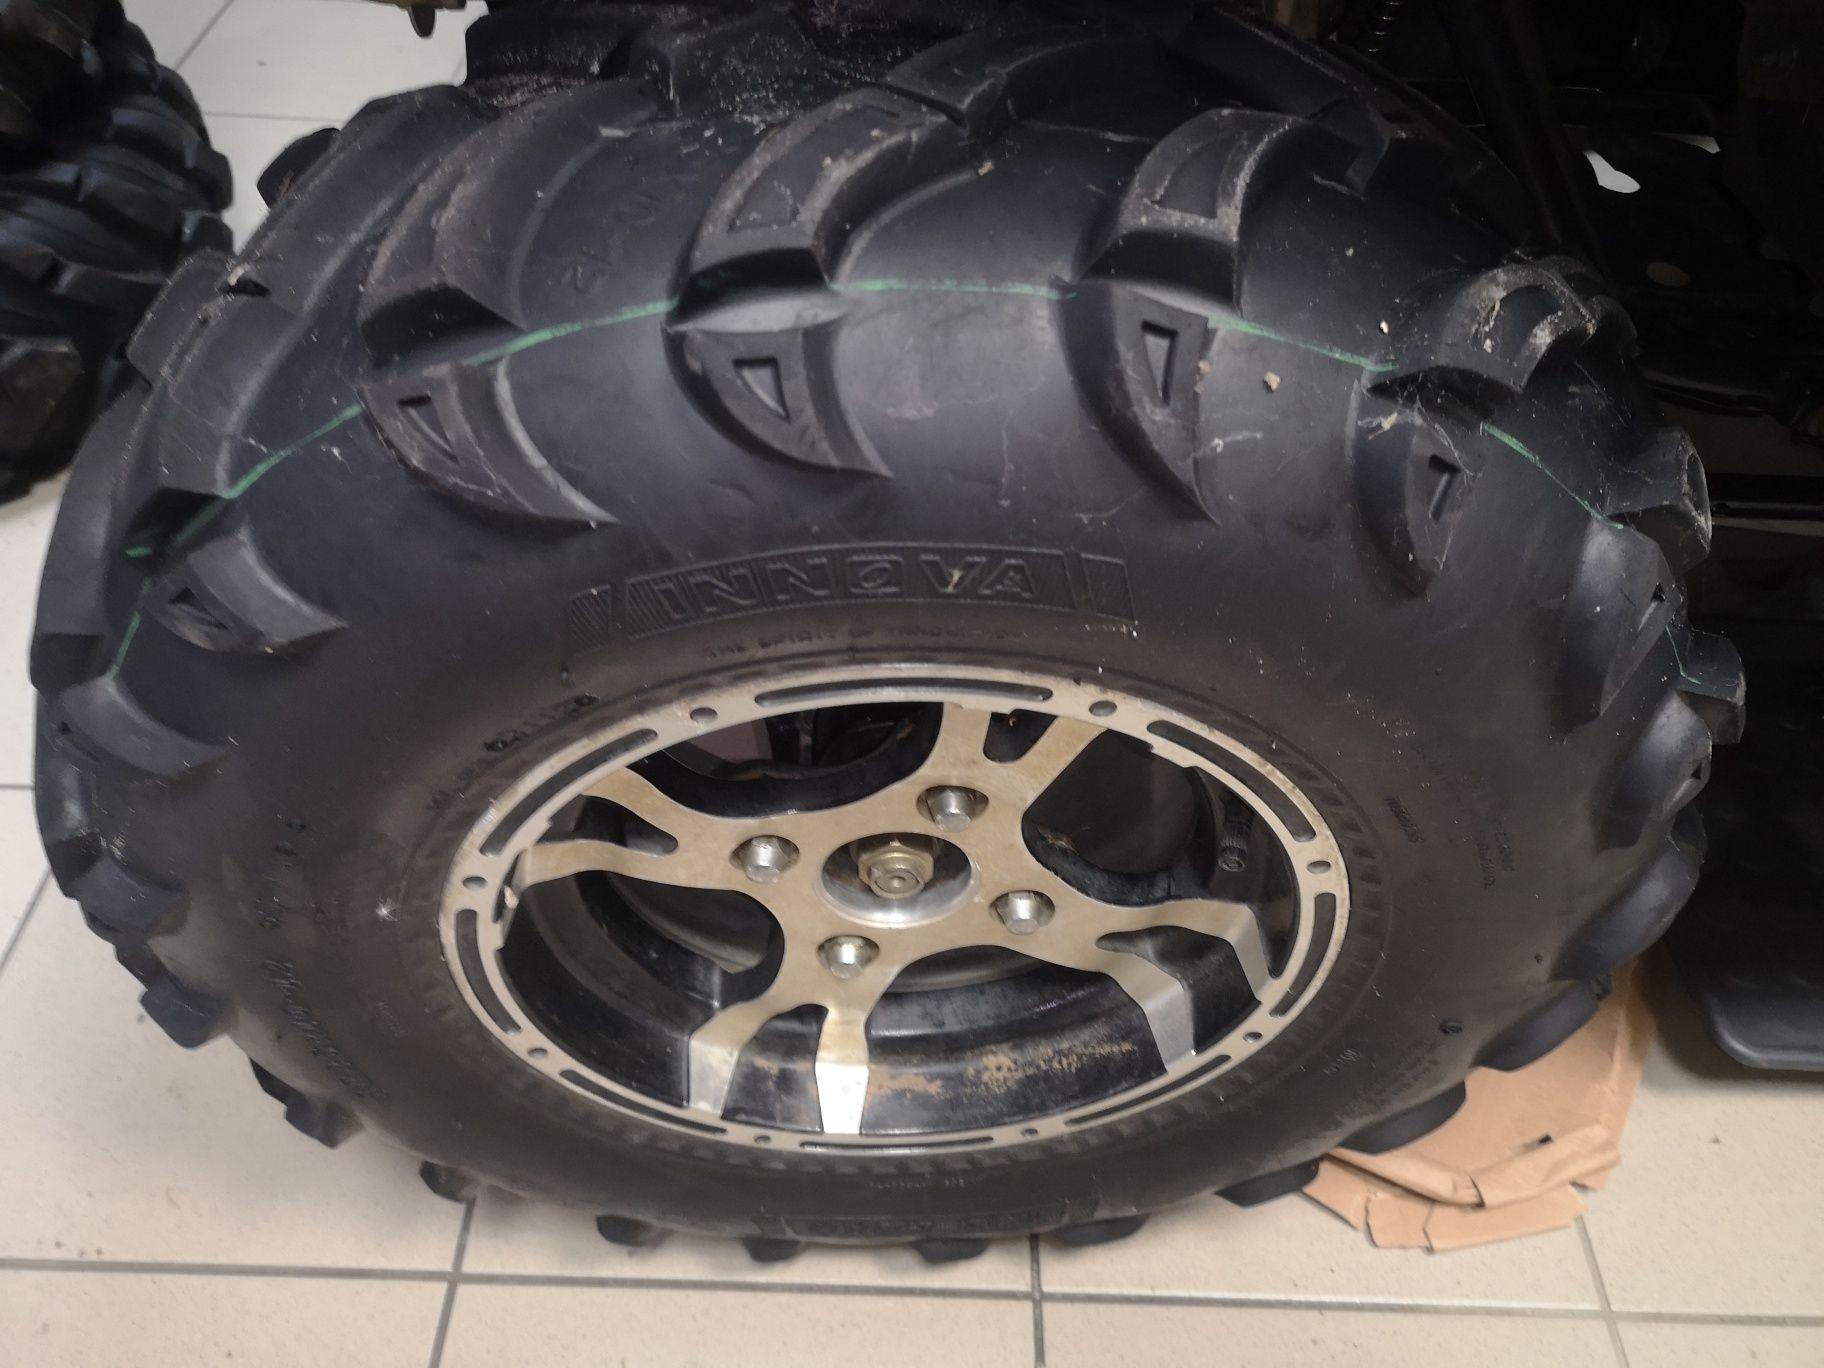 Комплект колес (шин) на квадроцикл 25Х8-12, 25х10-12